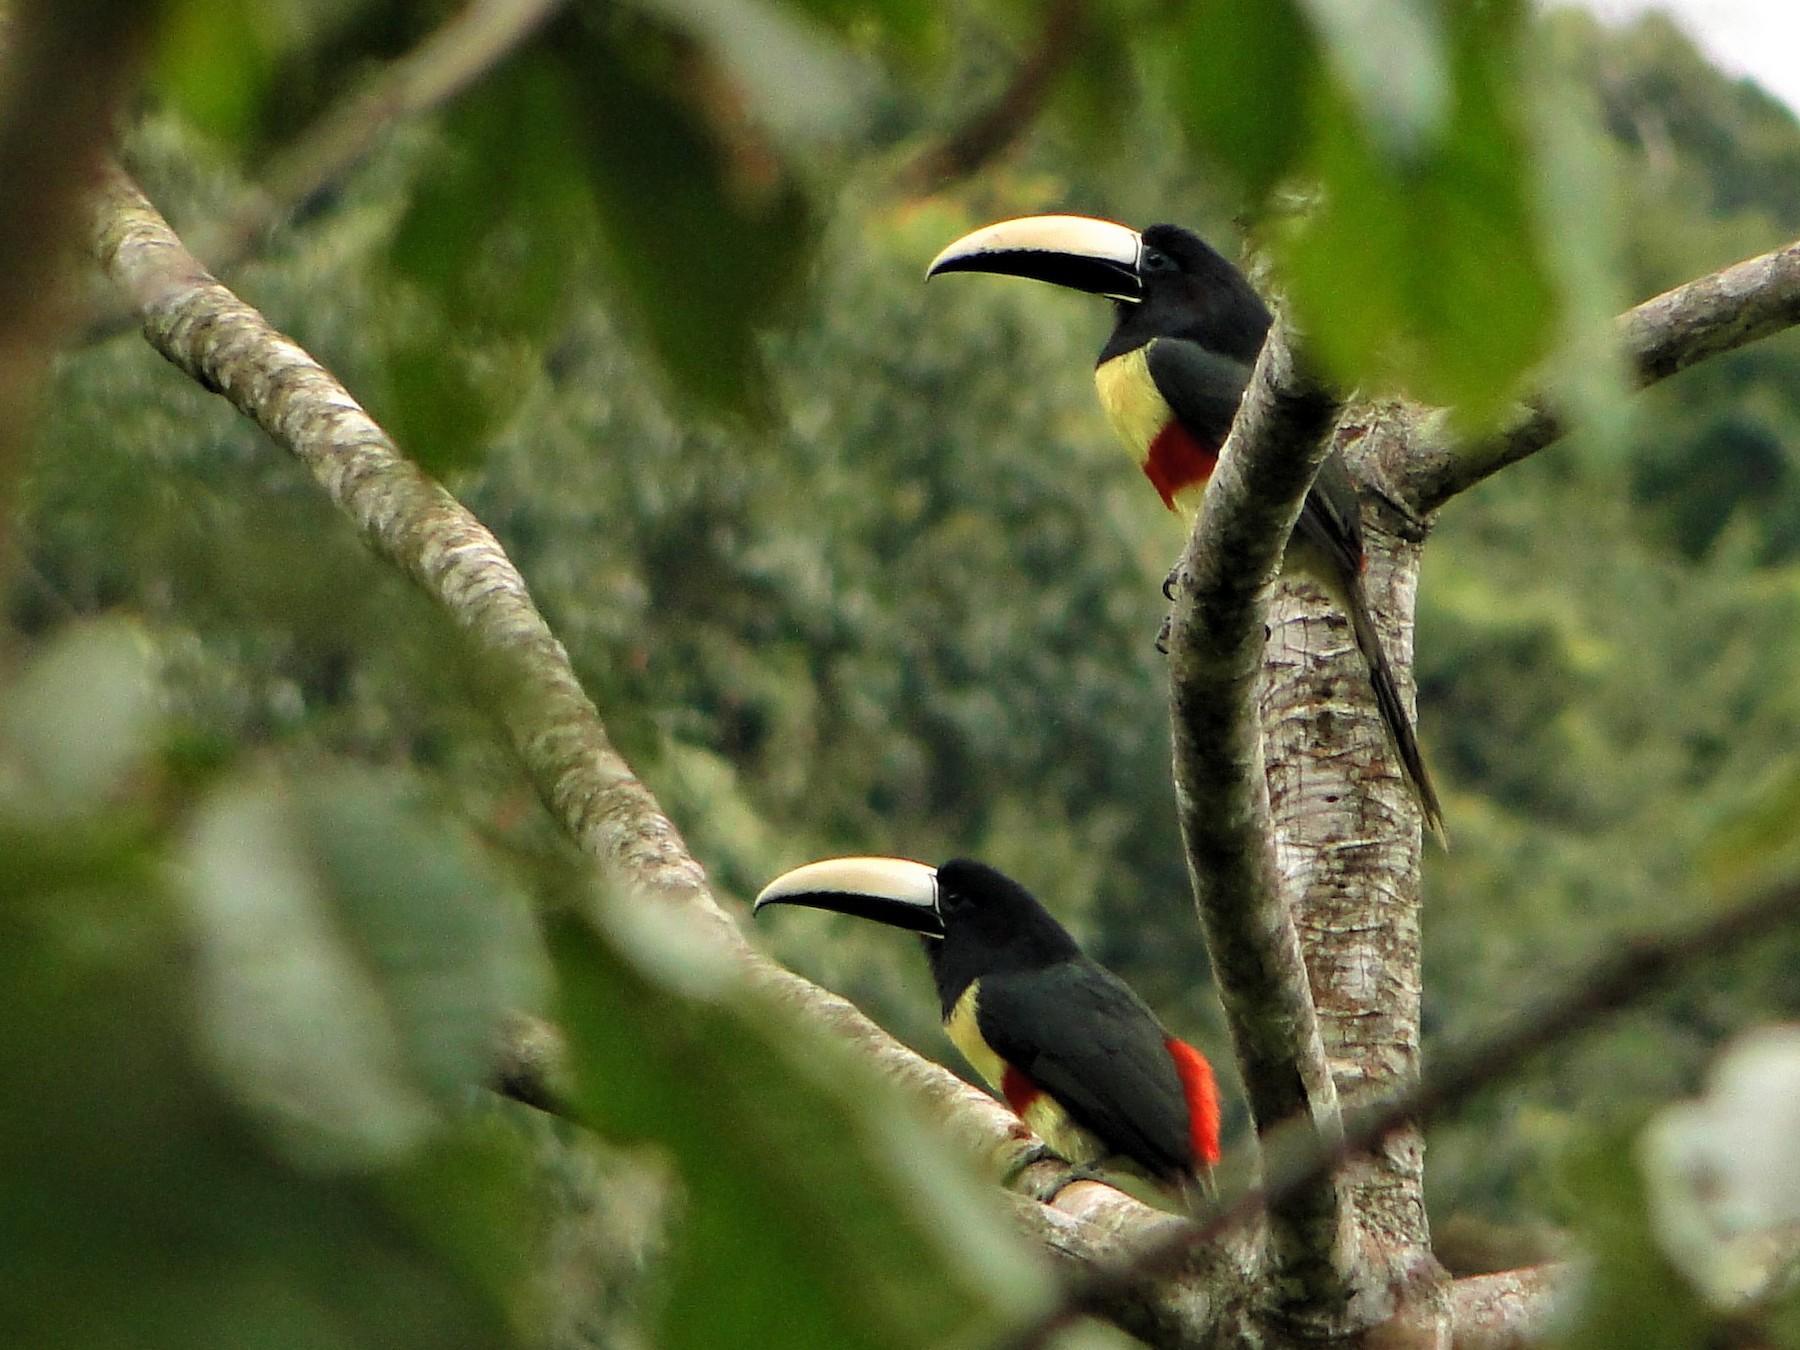 Black-necked Aracari - Carlos Gussoni